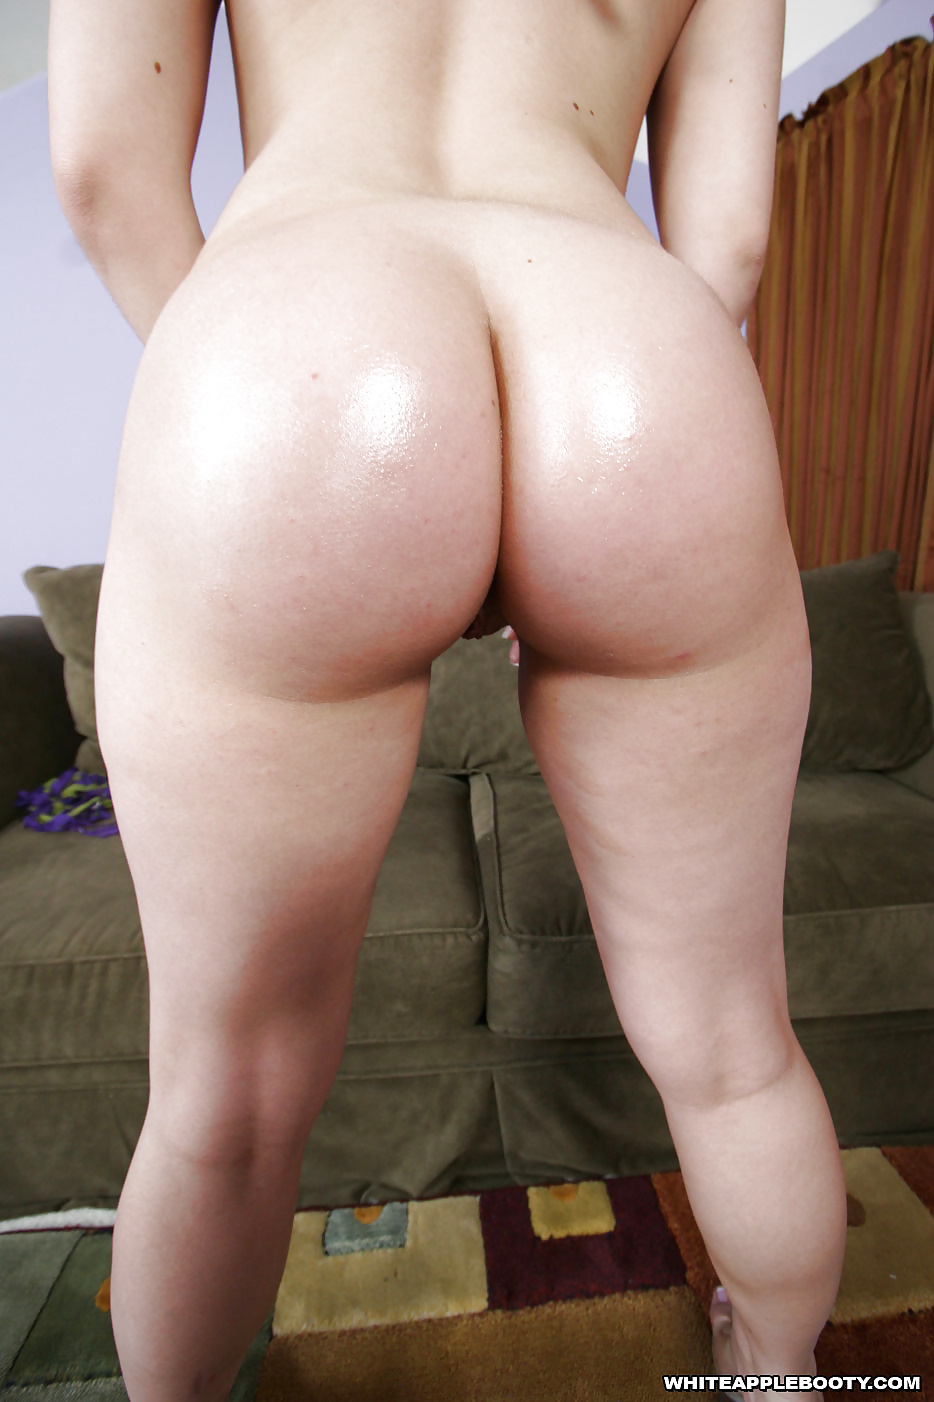 Big butt white girls nude